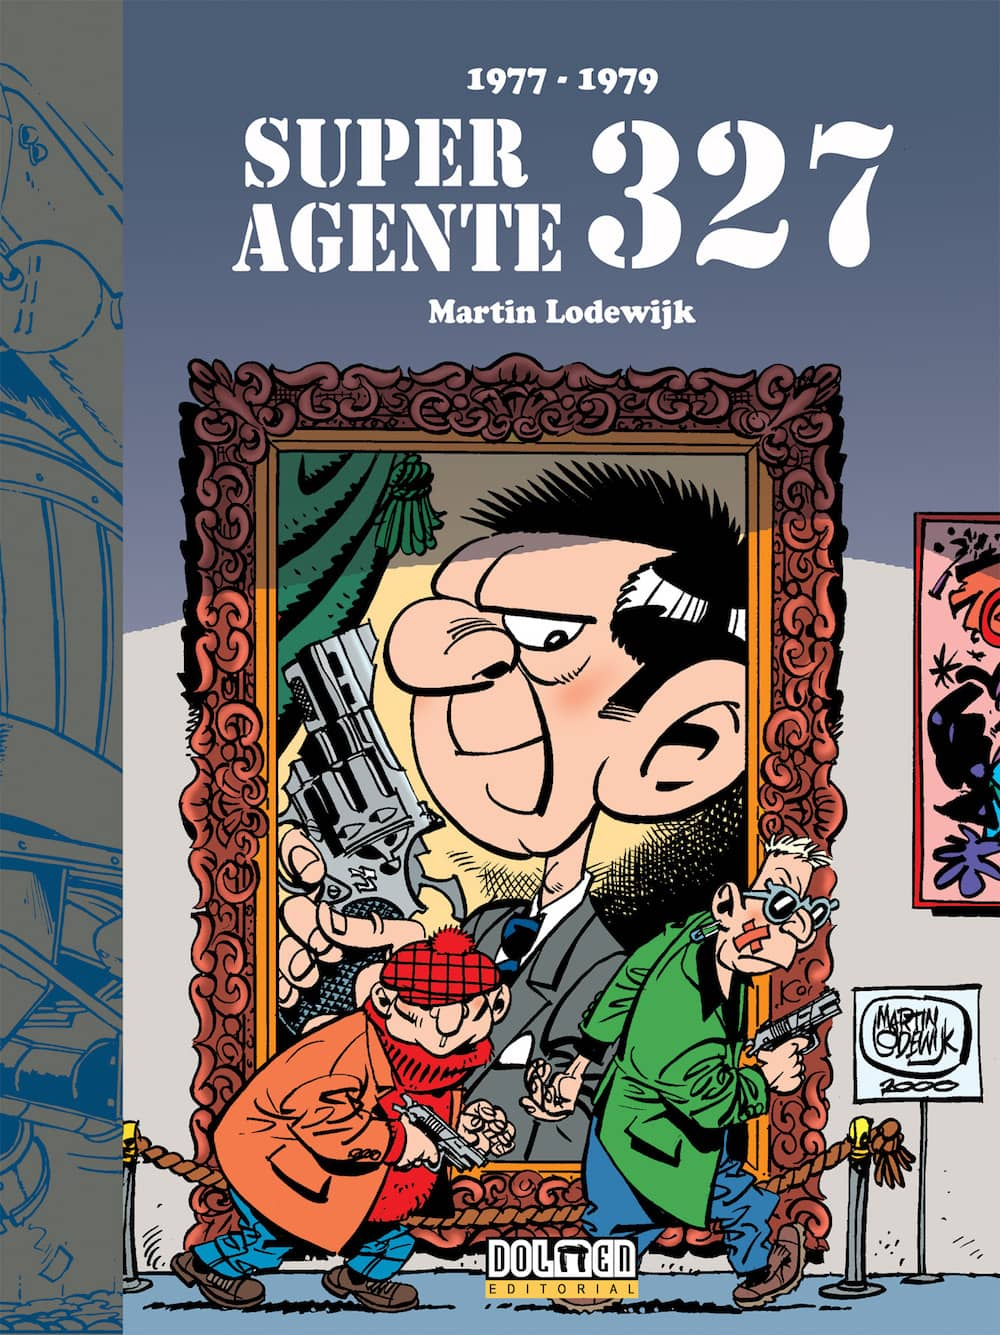 SUPERAGENTE 327